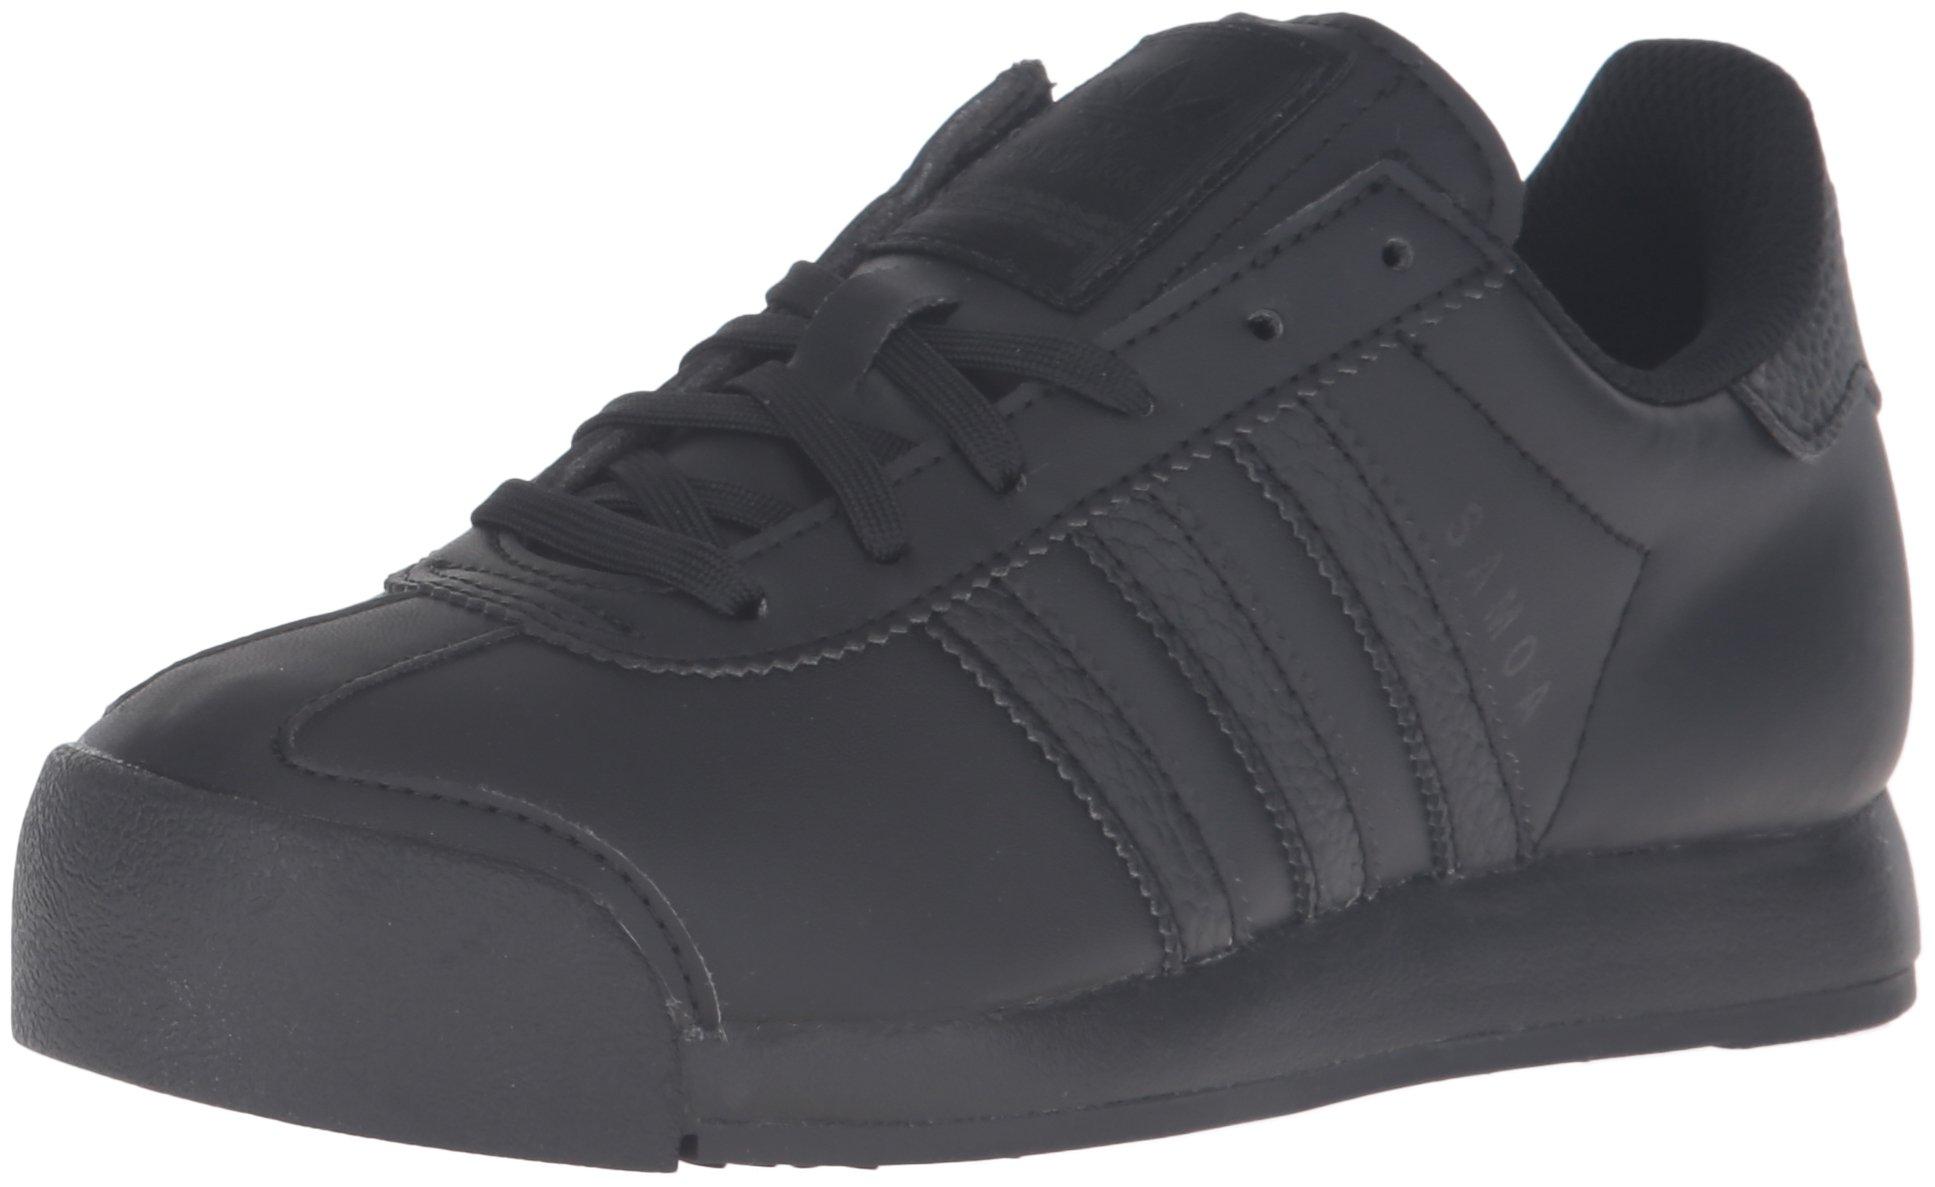 adidas Originals Boys' Samoa J Running Shoe, Black, 5 M US Big Kid